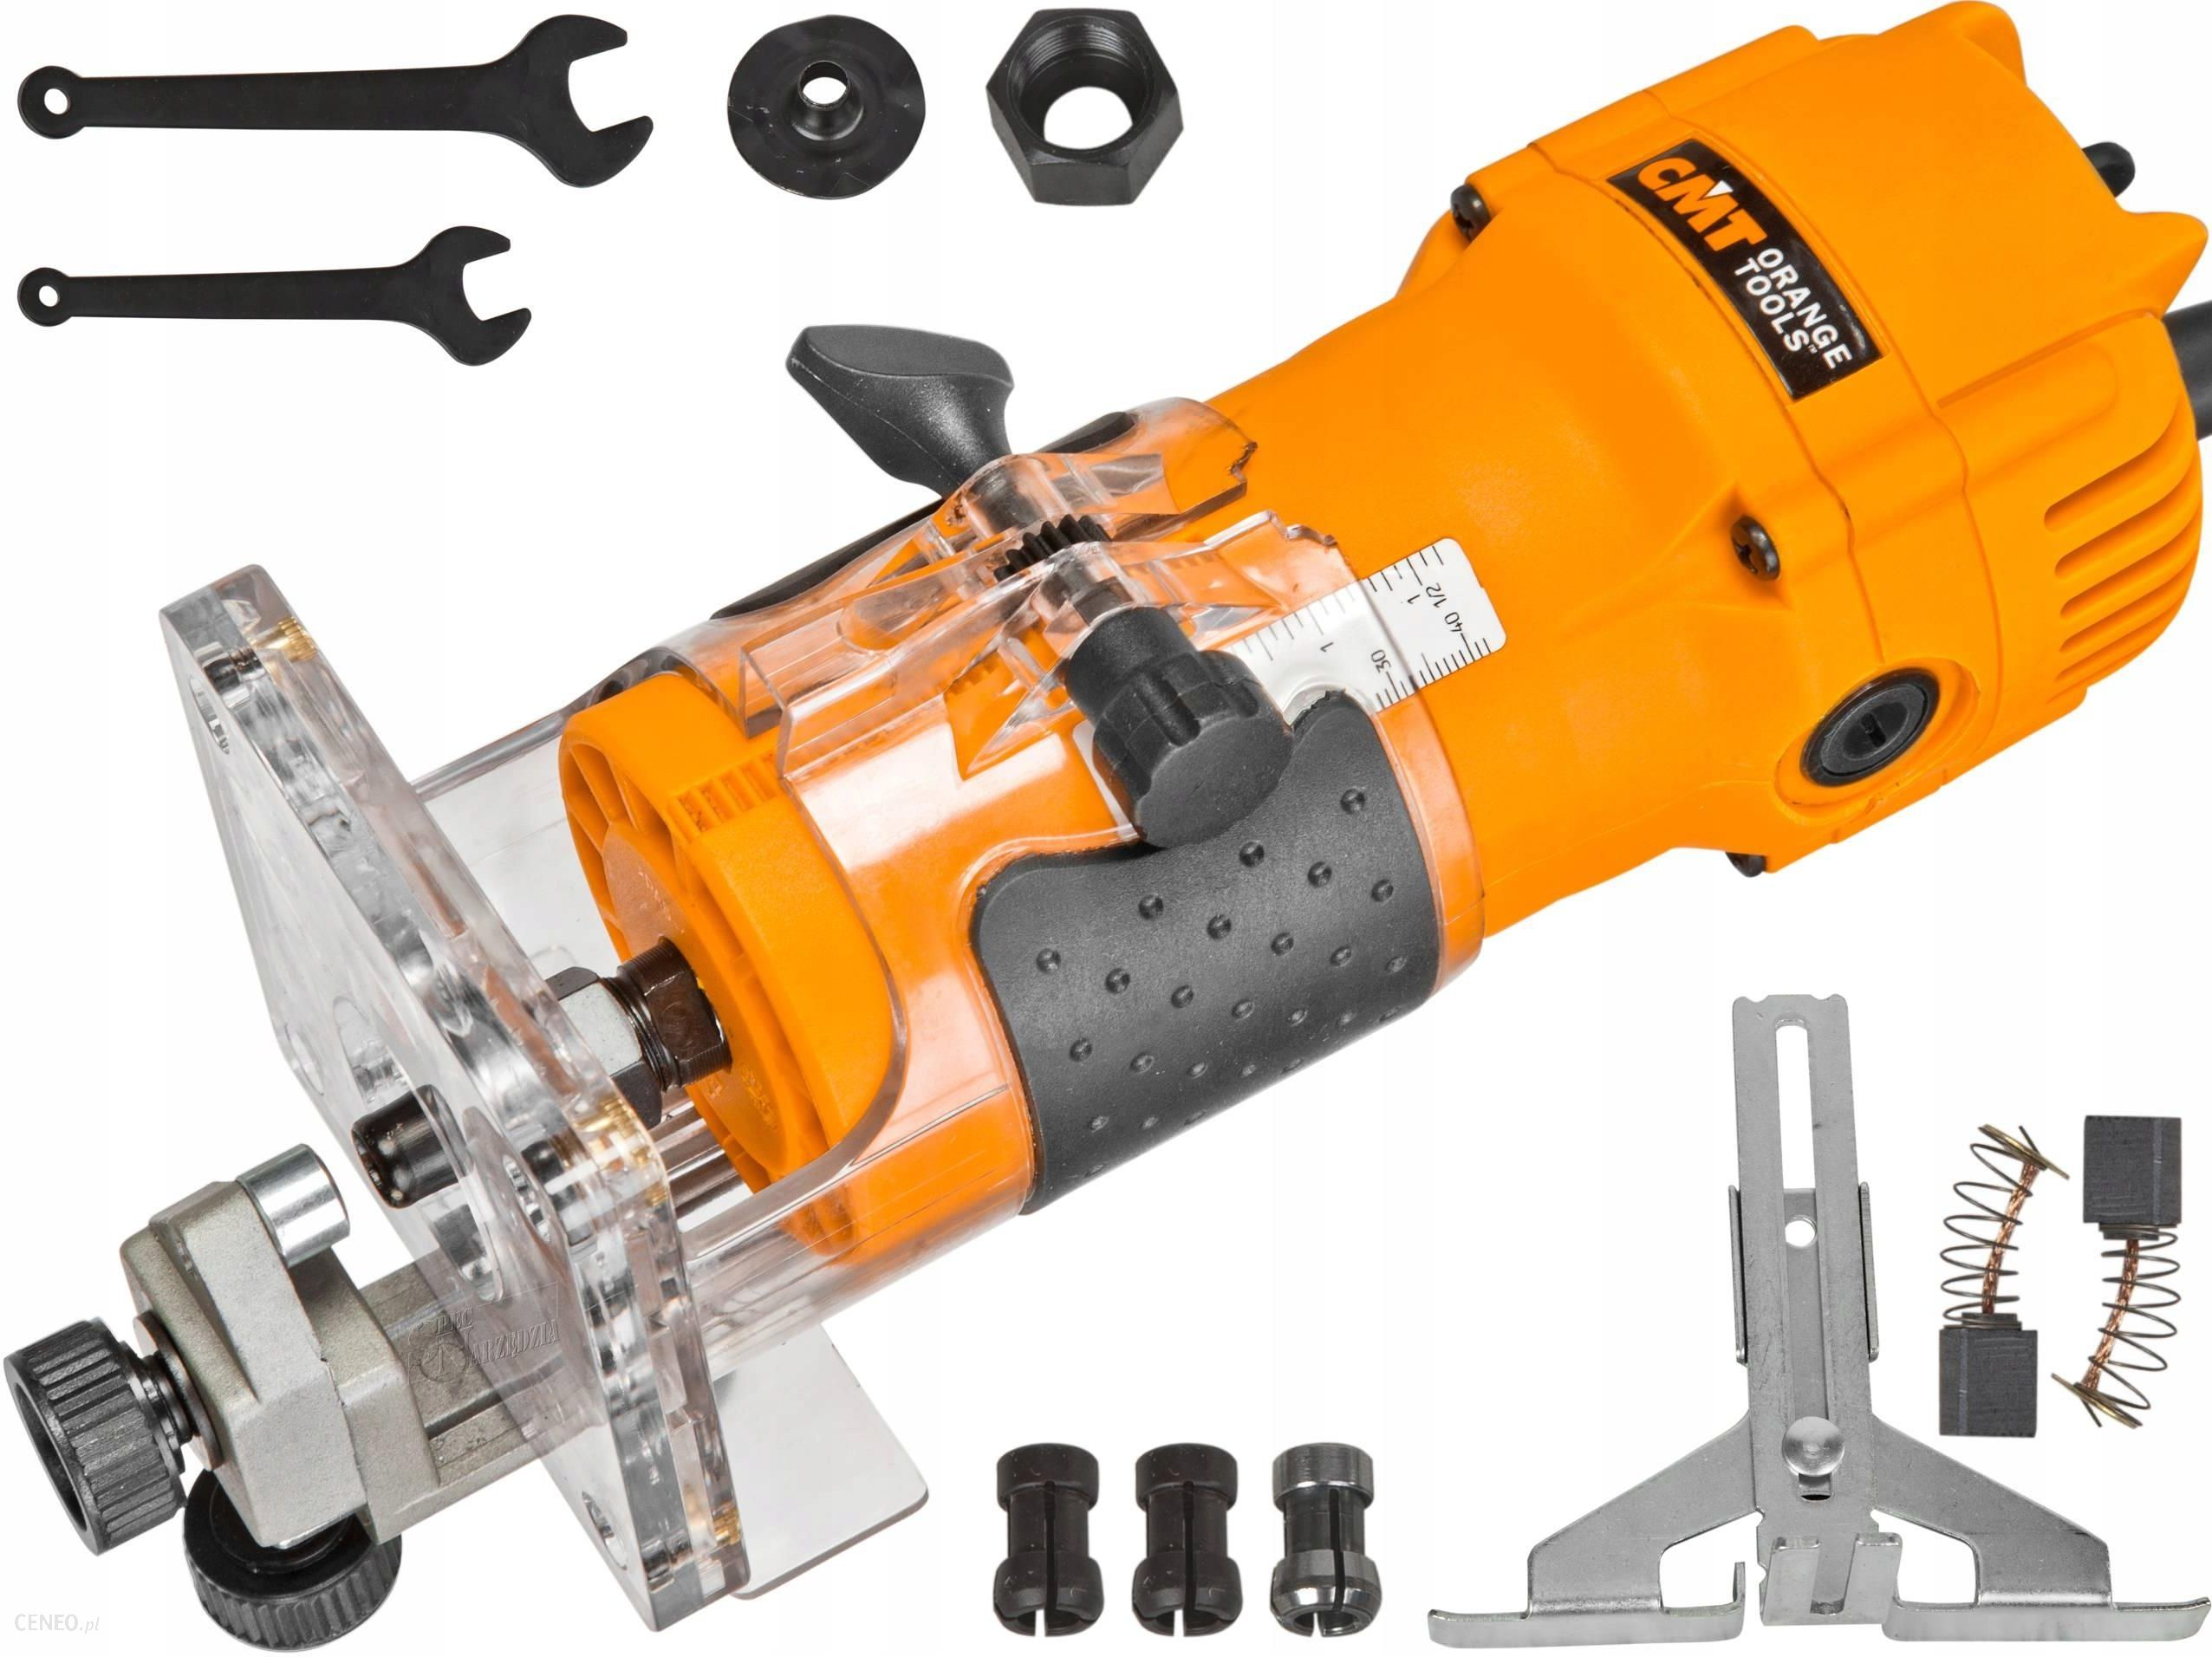 Cmt Orange Tools CMT10 34685